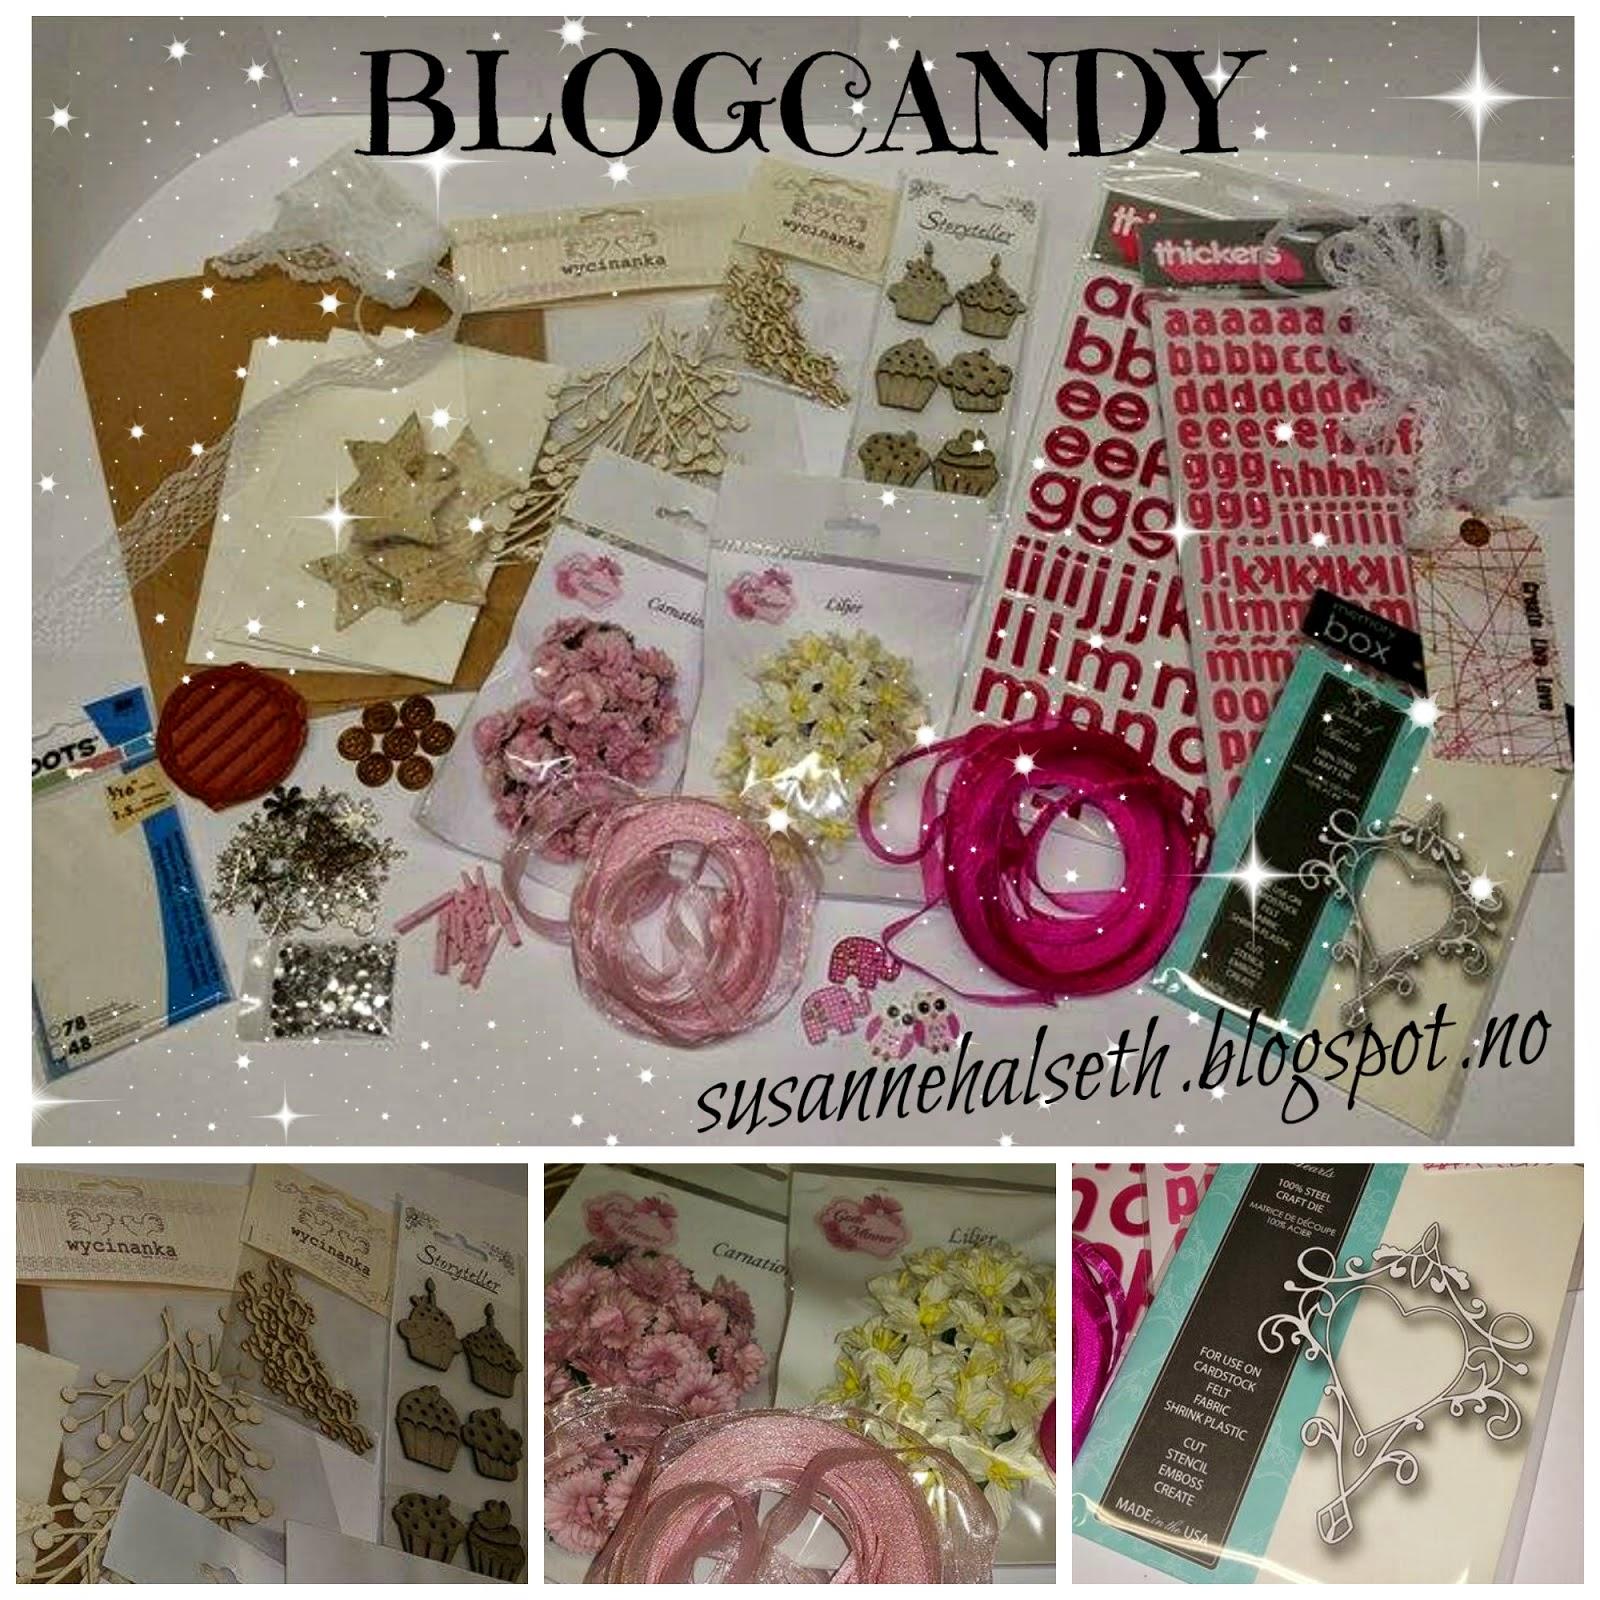 Bloggcandy